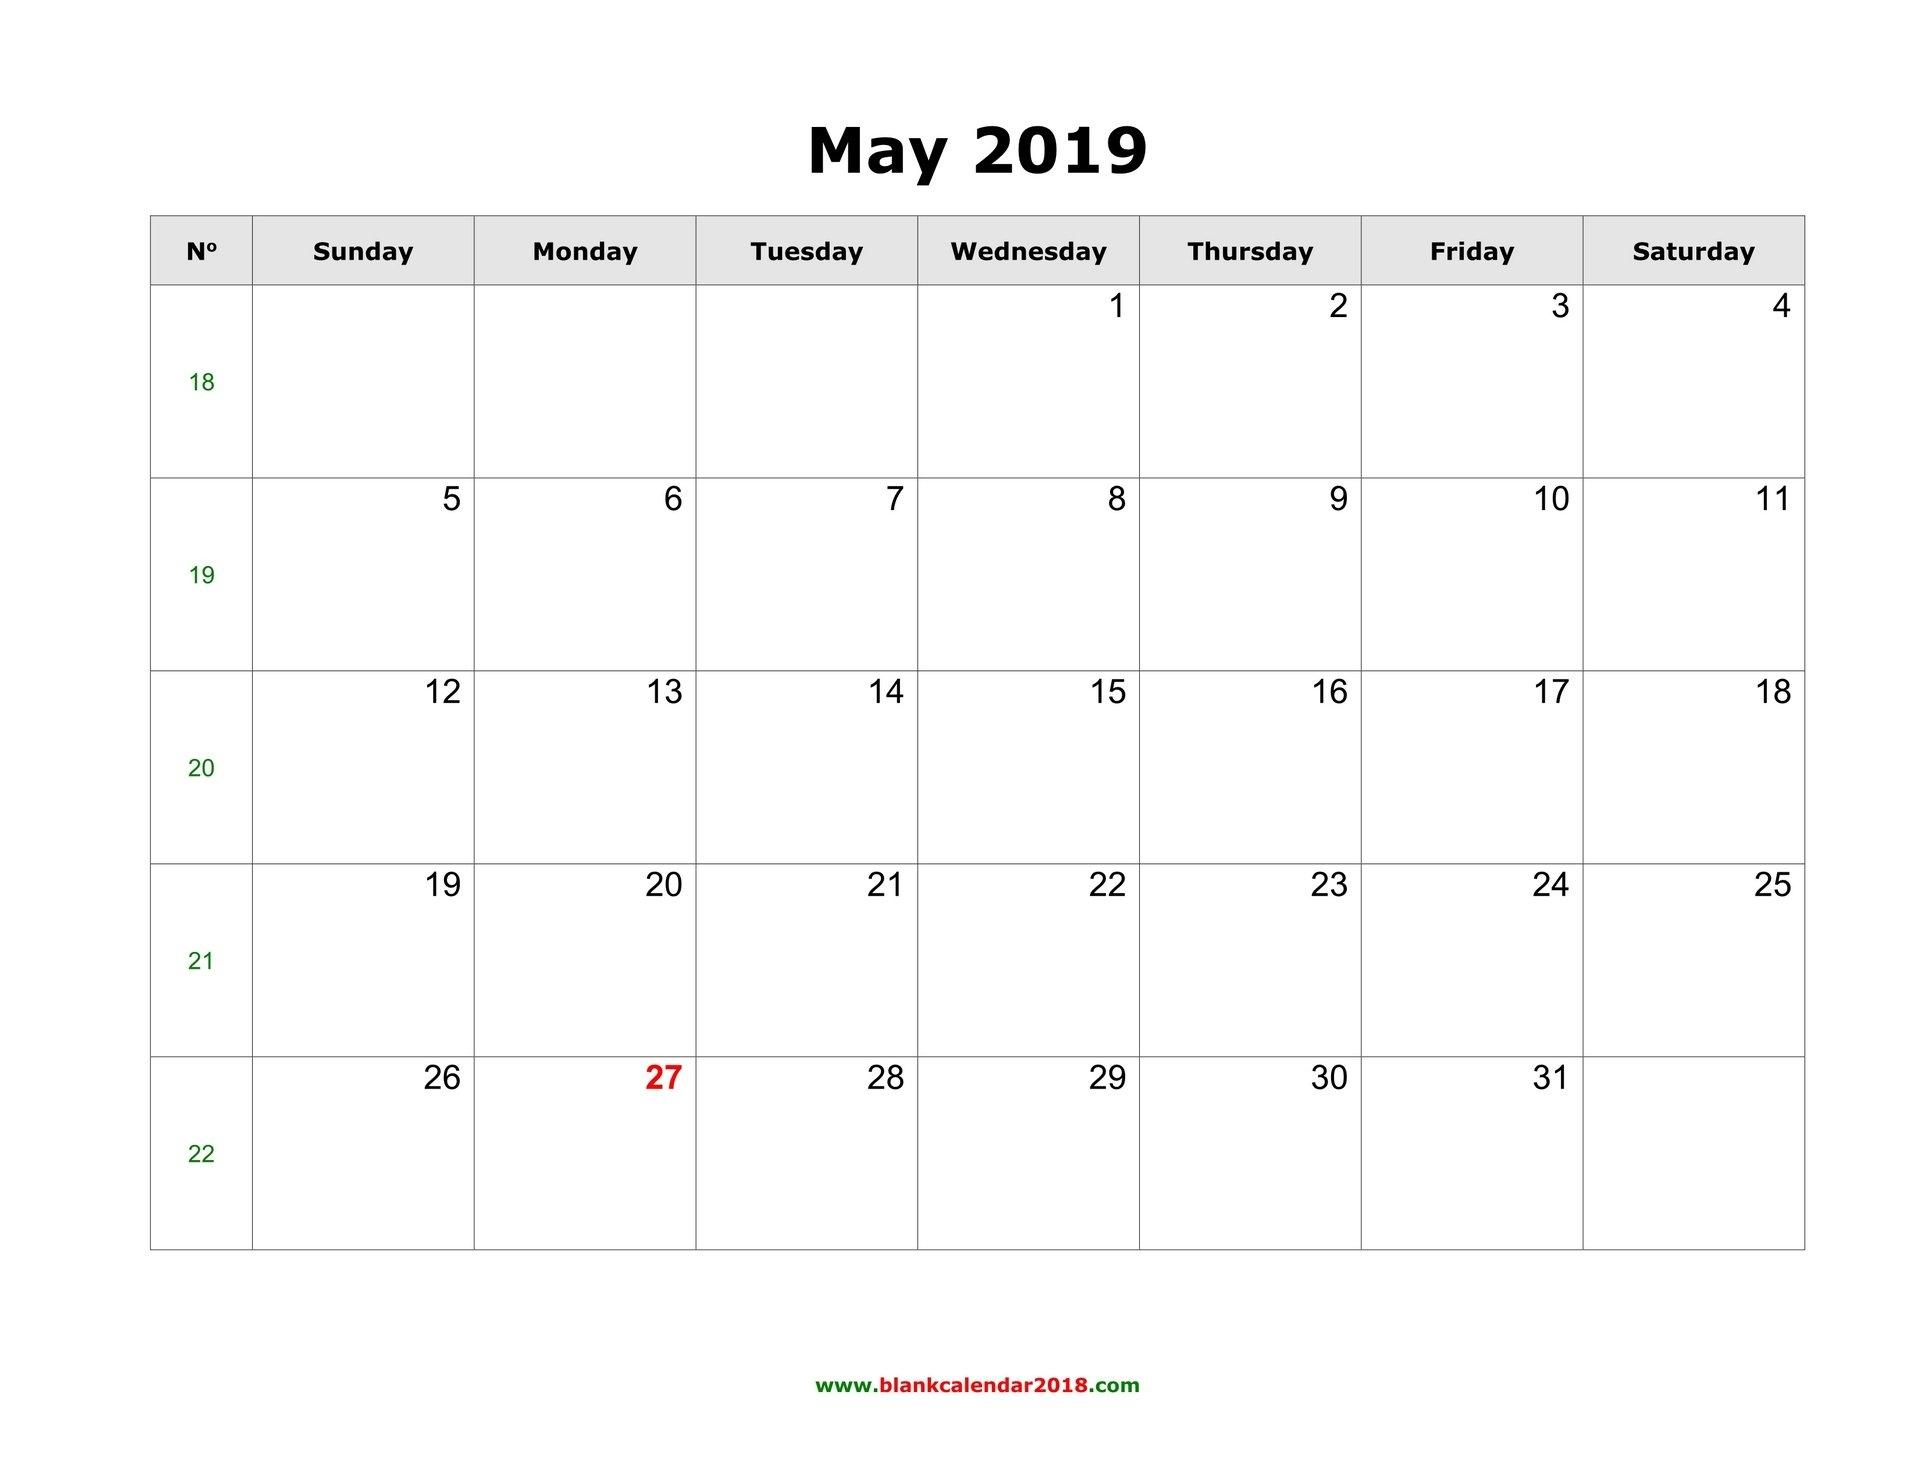 Blank Calendar For May 2019 Calendar 2019 May